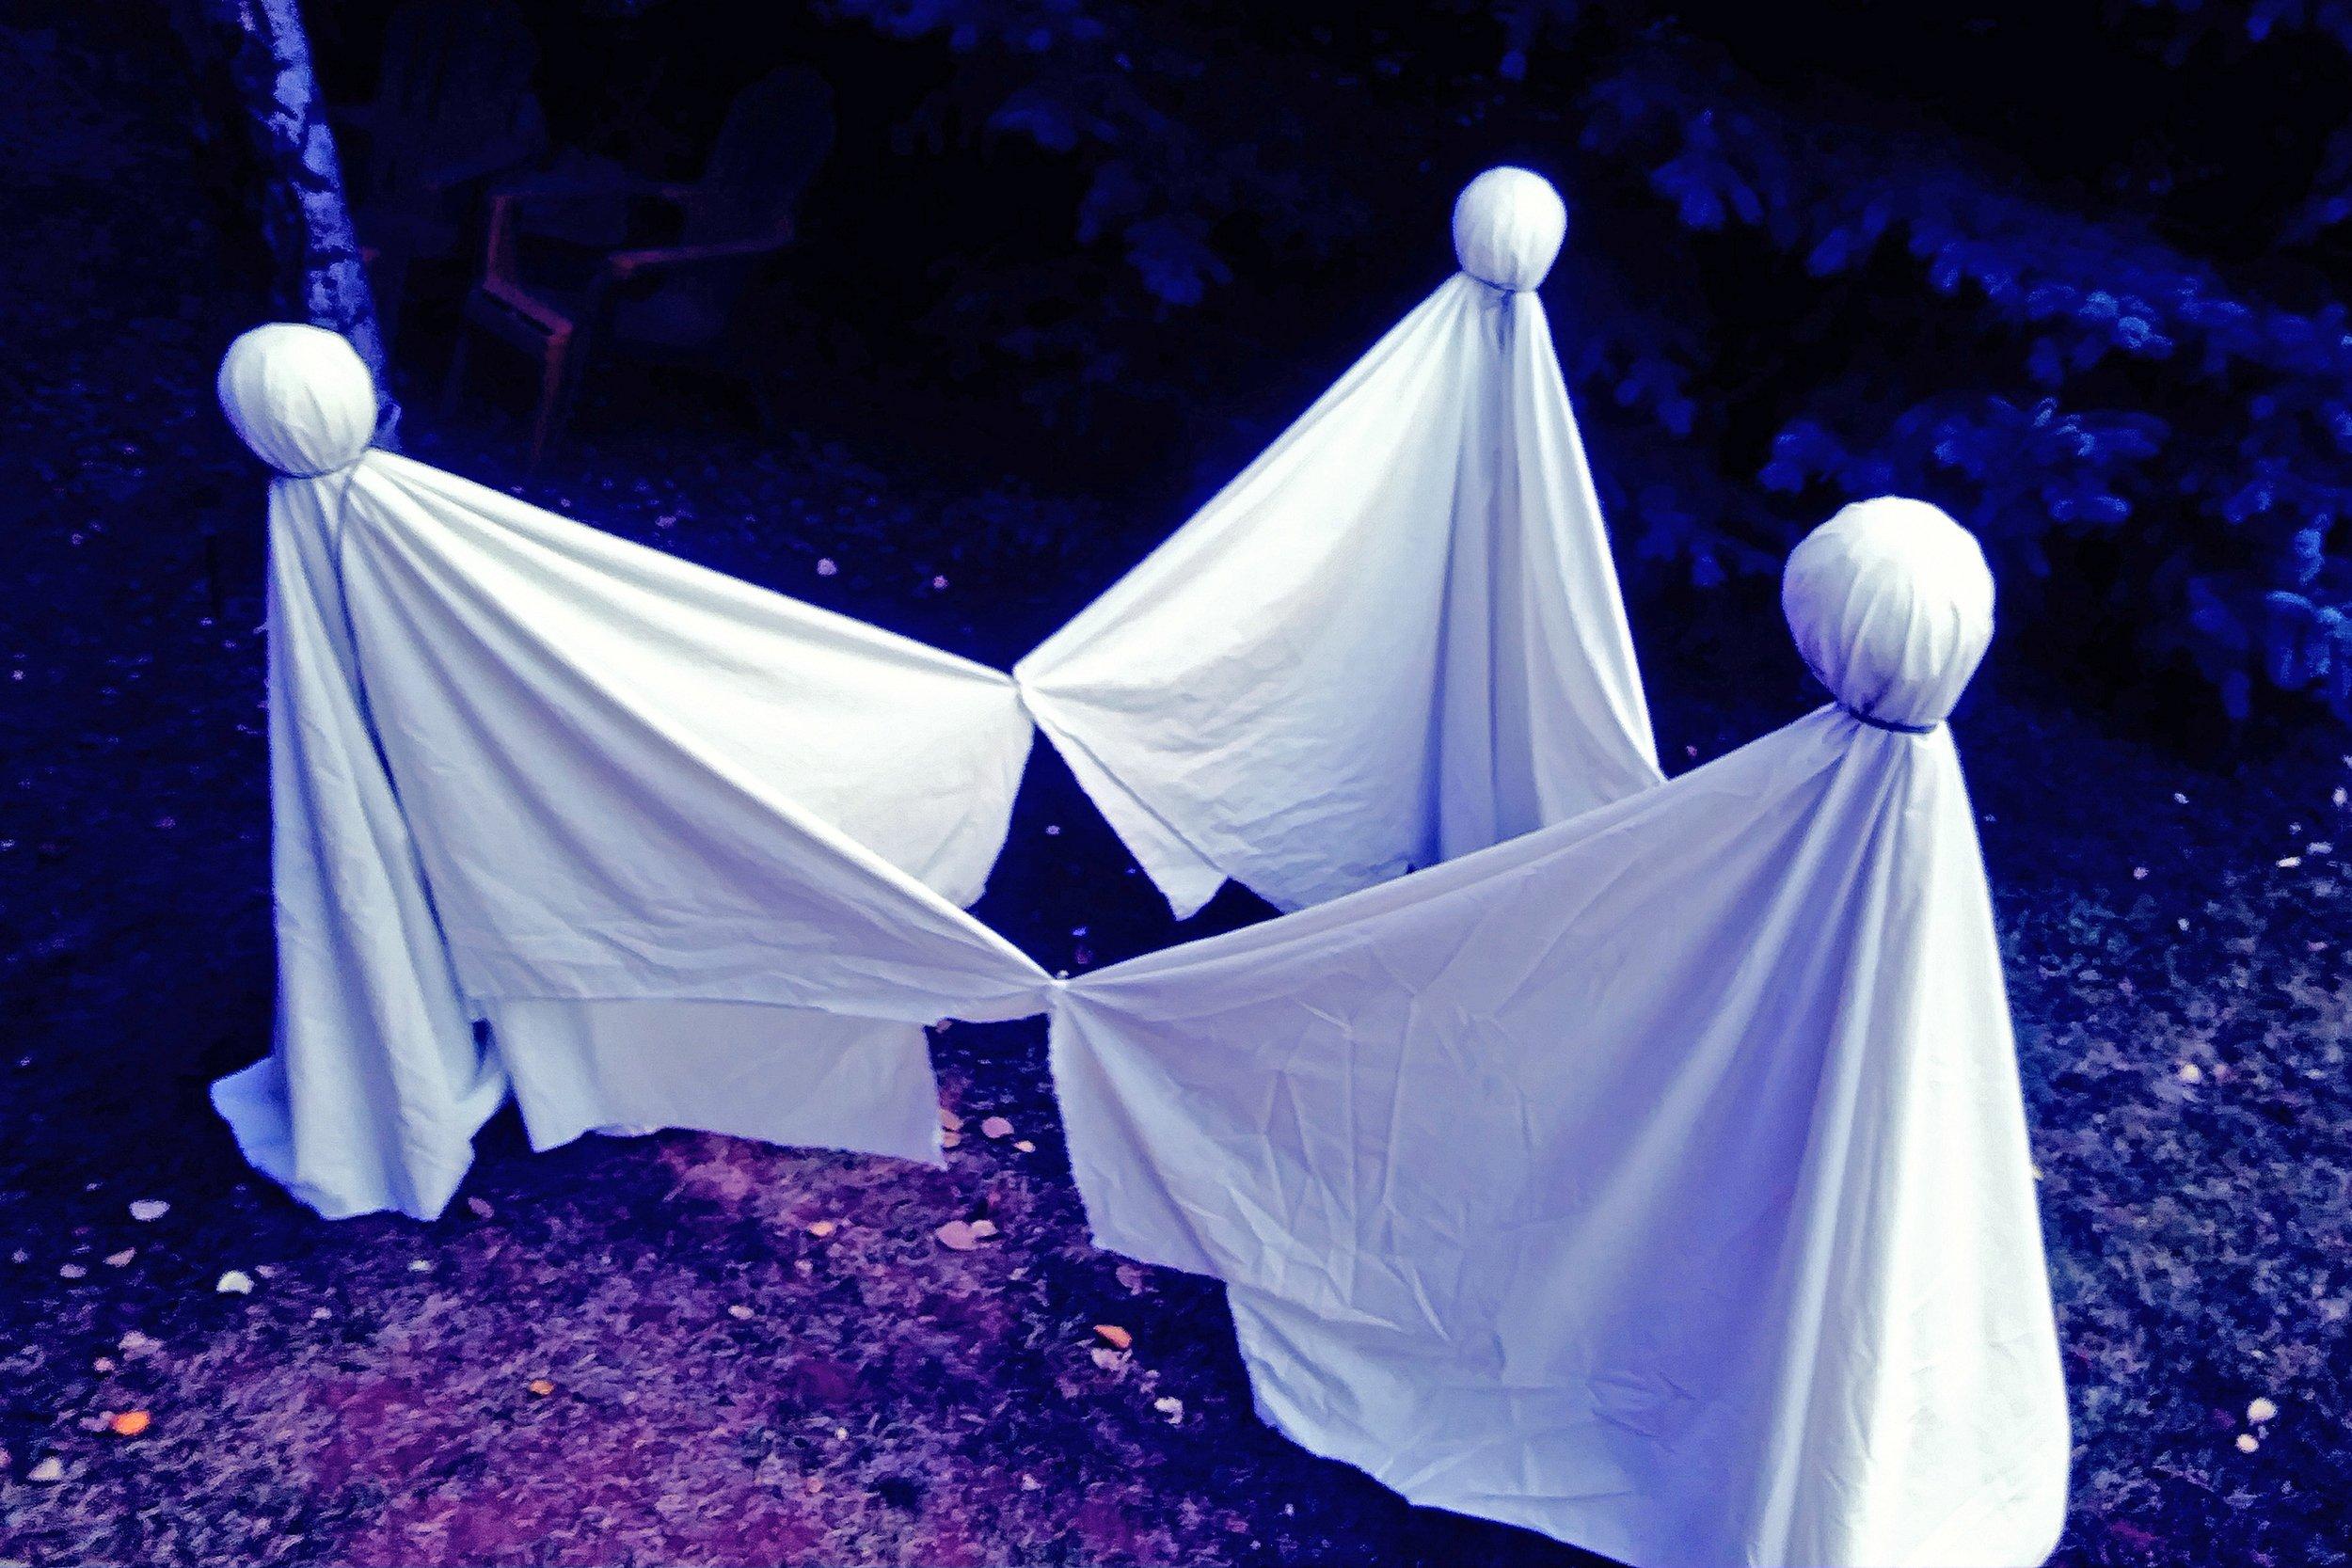 A grave Halloween thumbnail